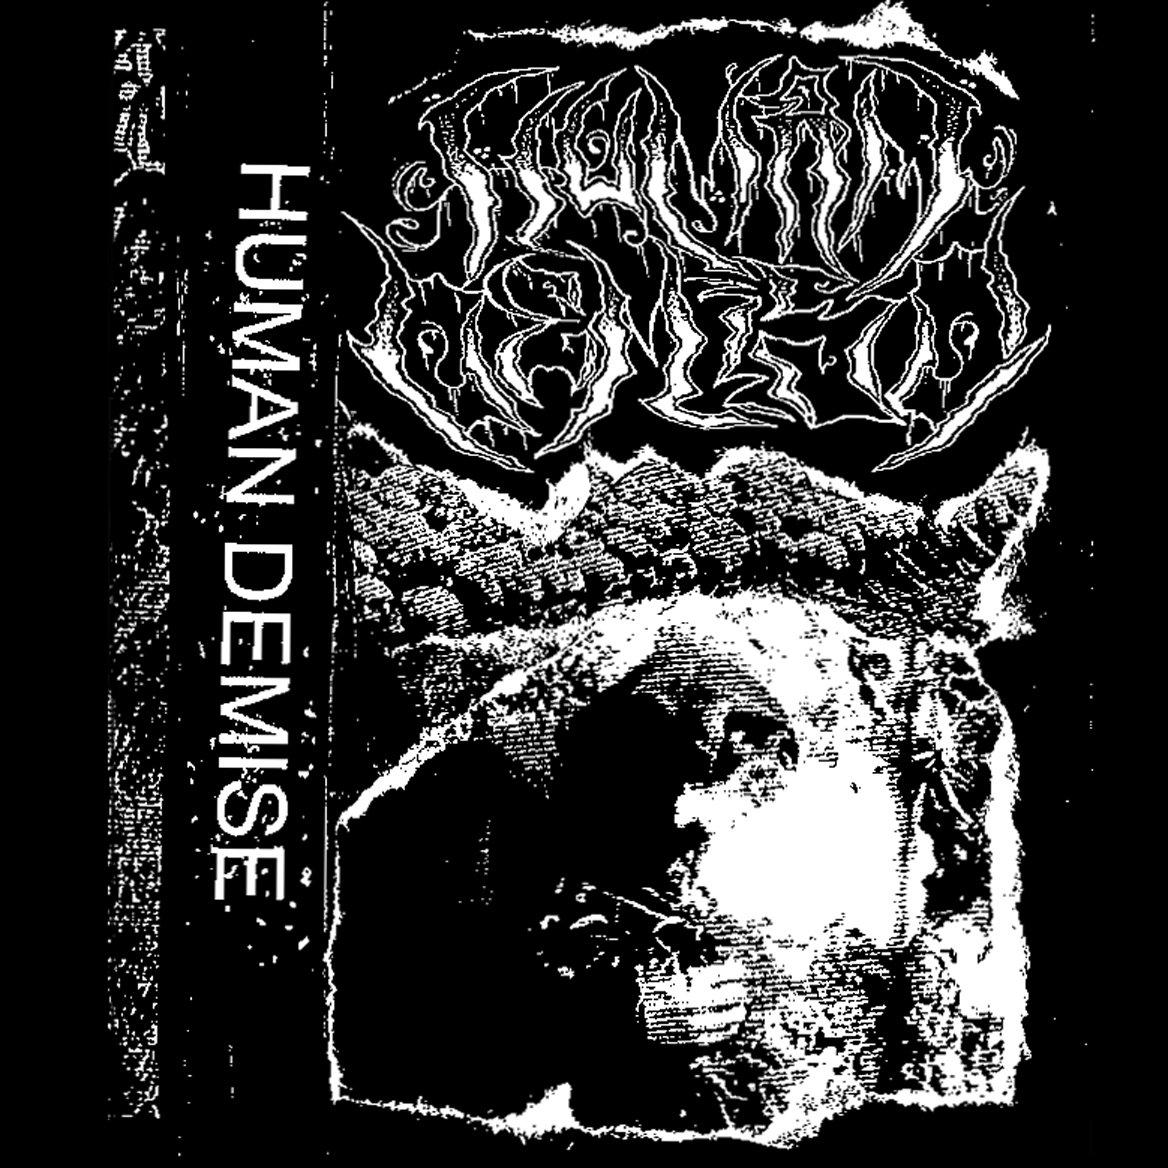 Human Demise - Human Demise (2013)